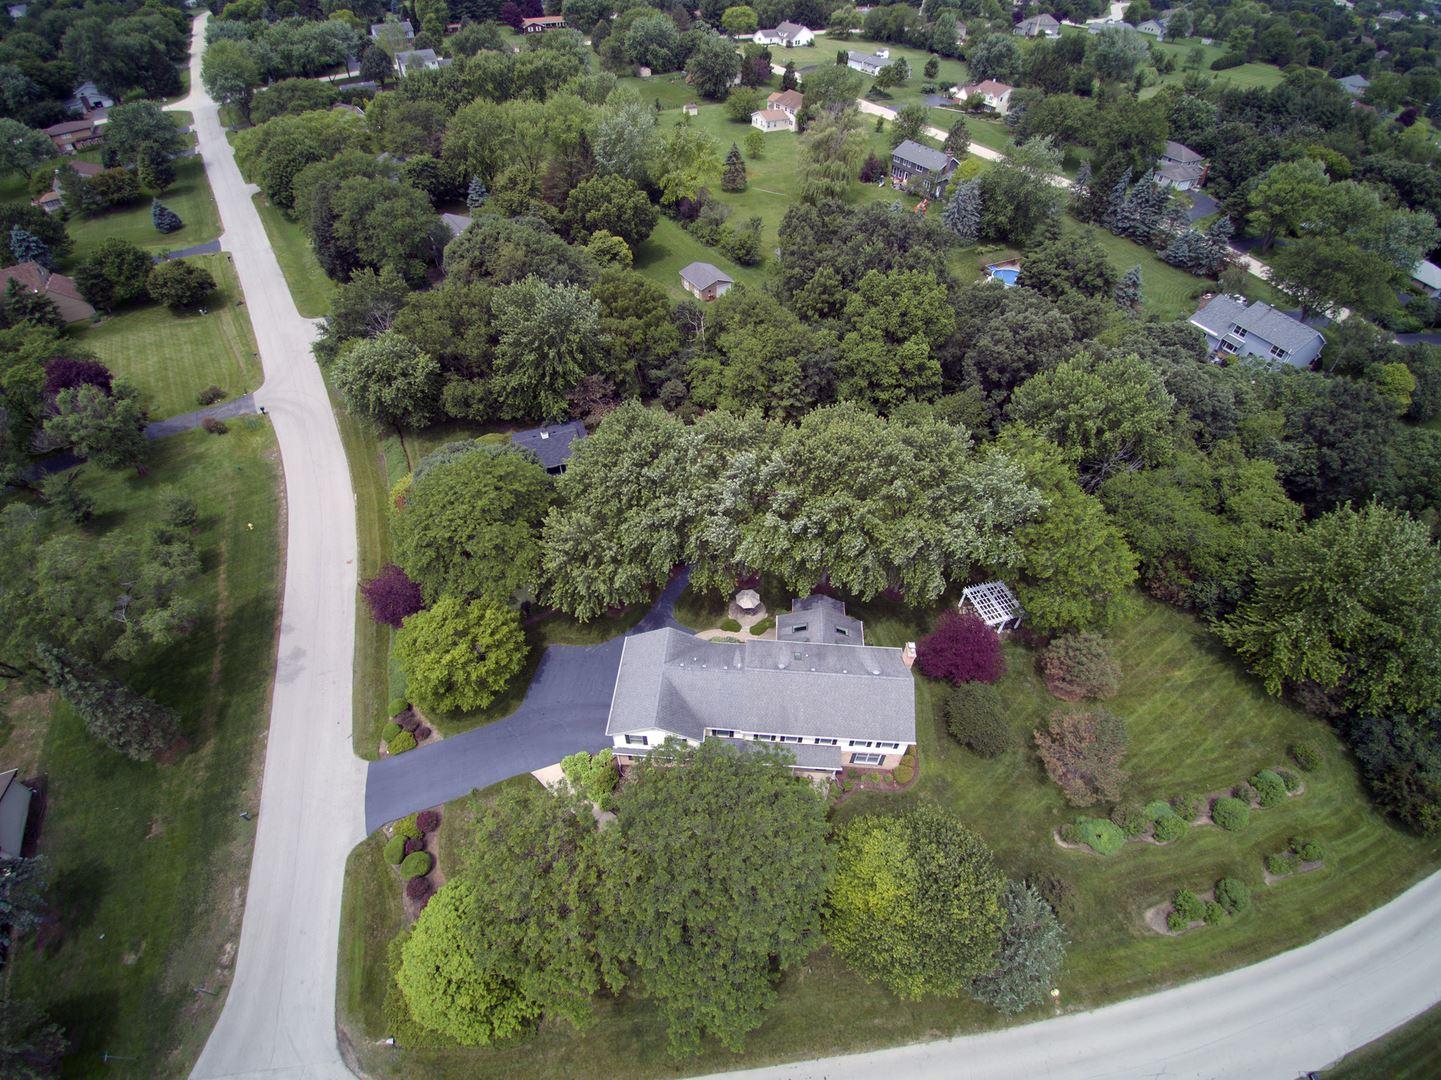 6N430 River Grange Road, Saint Charles, IL 60175 - #: 10642103